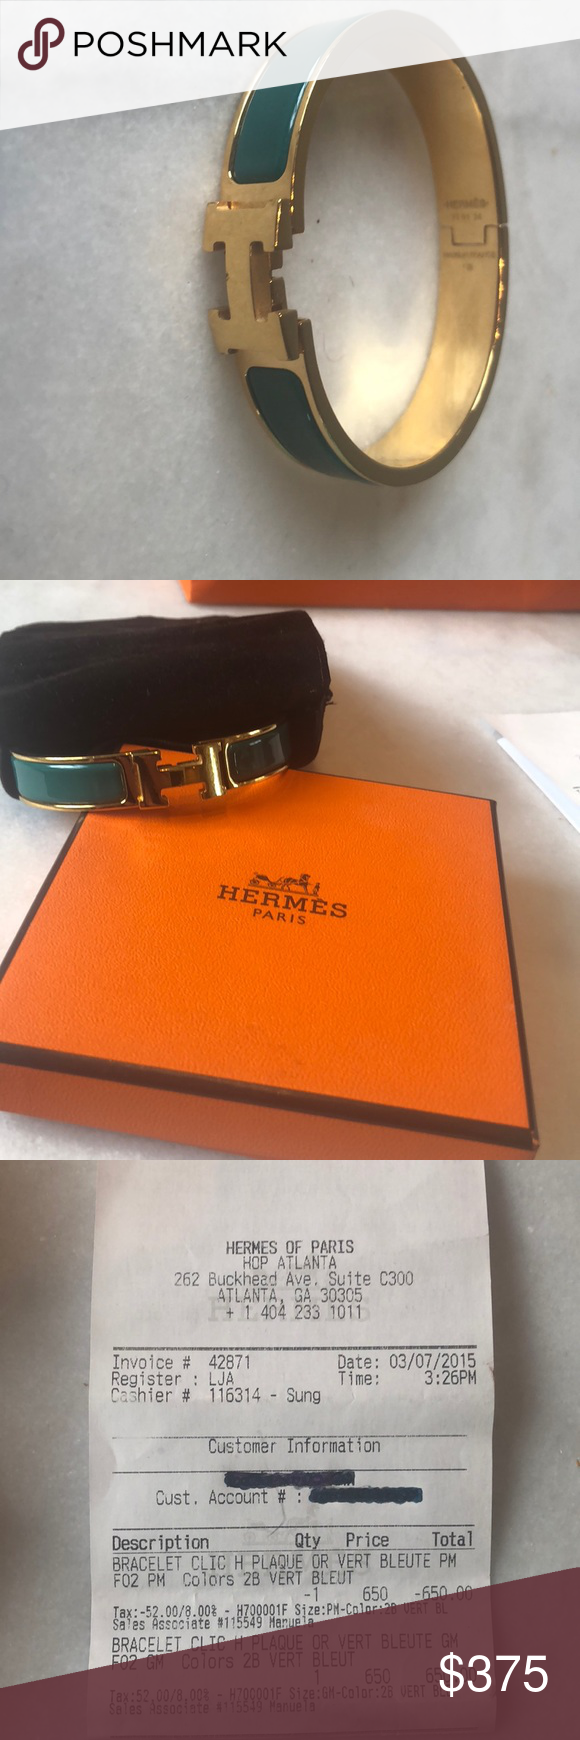 Hermes Bracelet Size Pm Gm